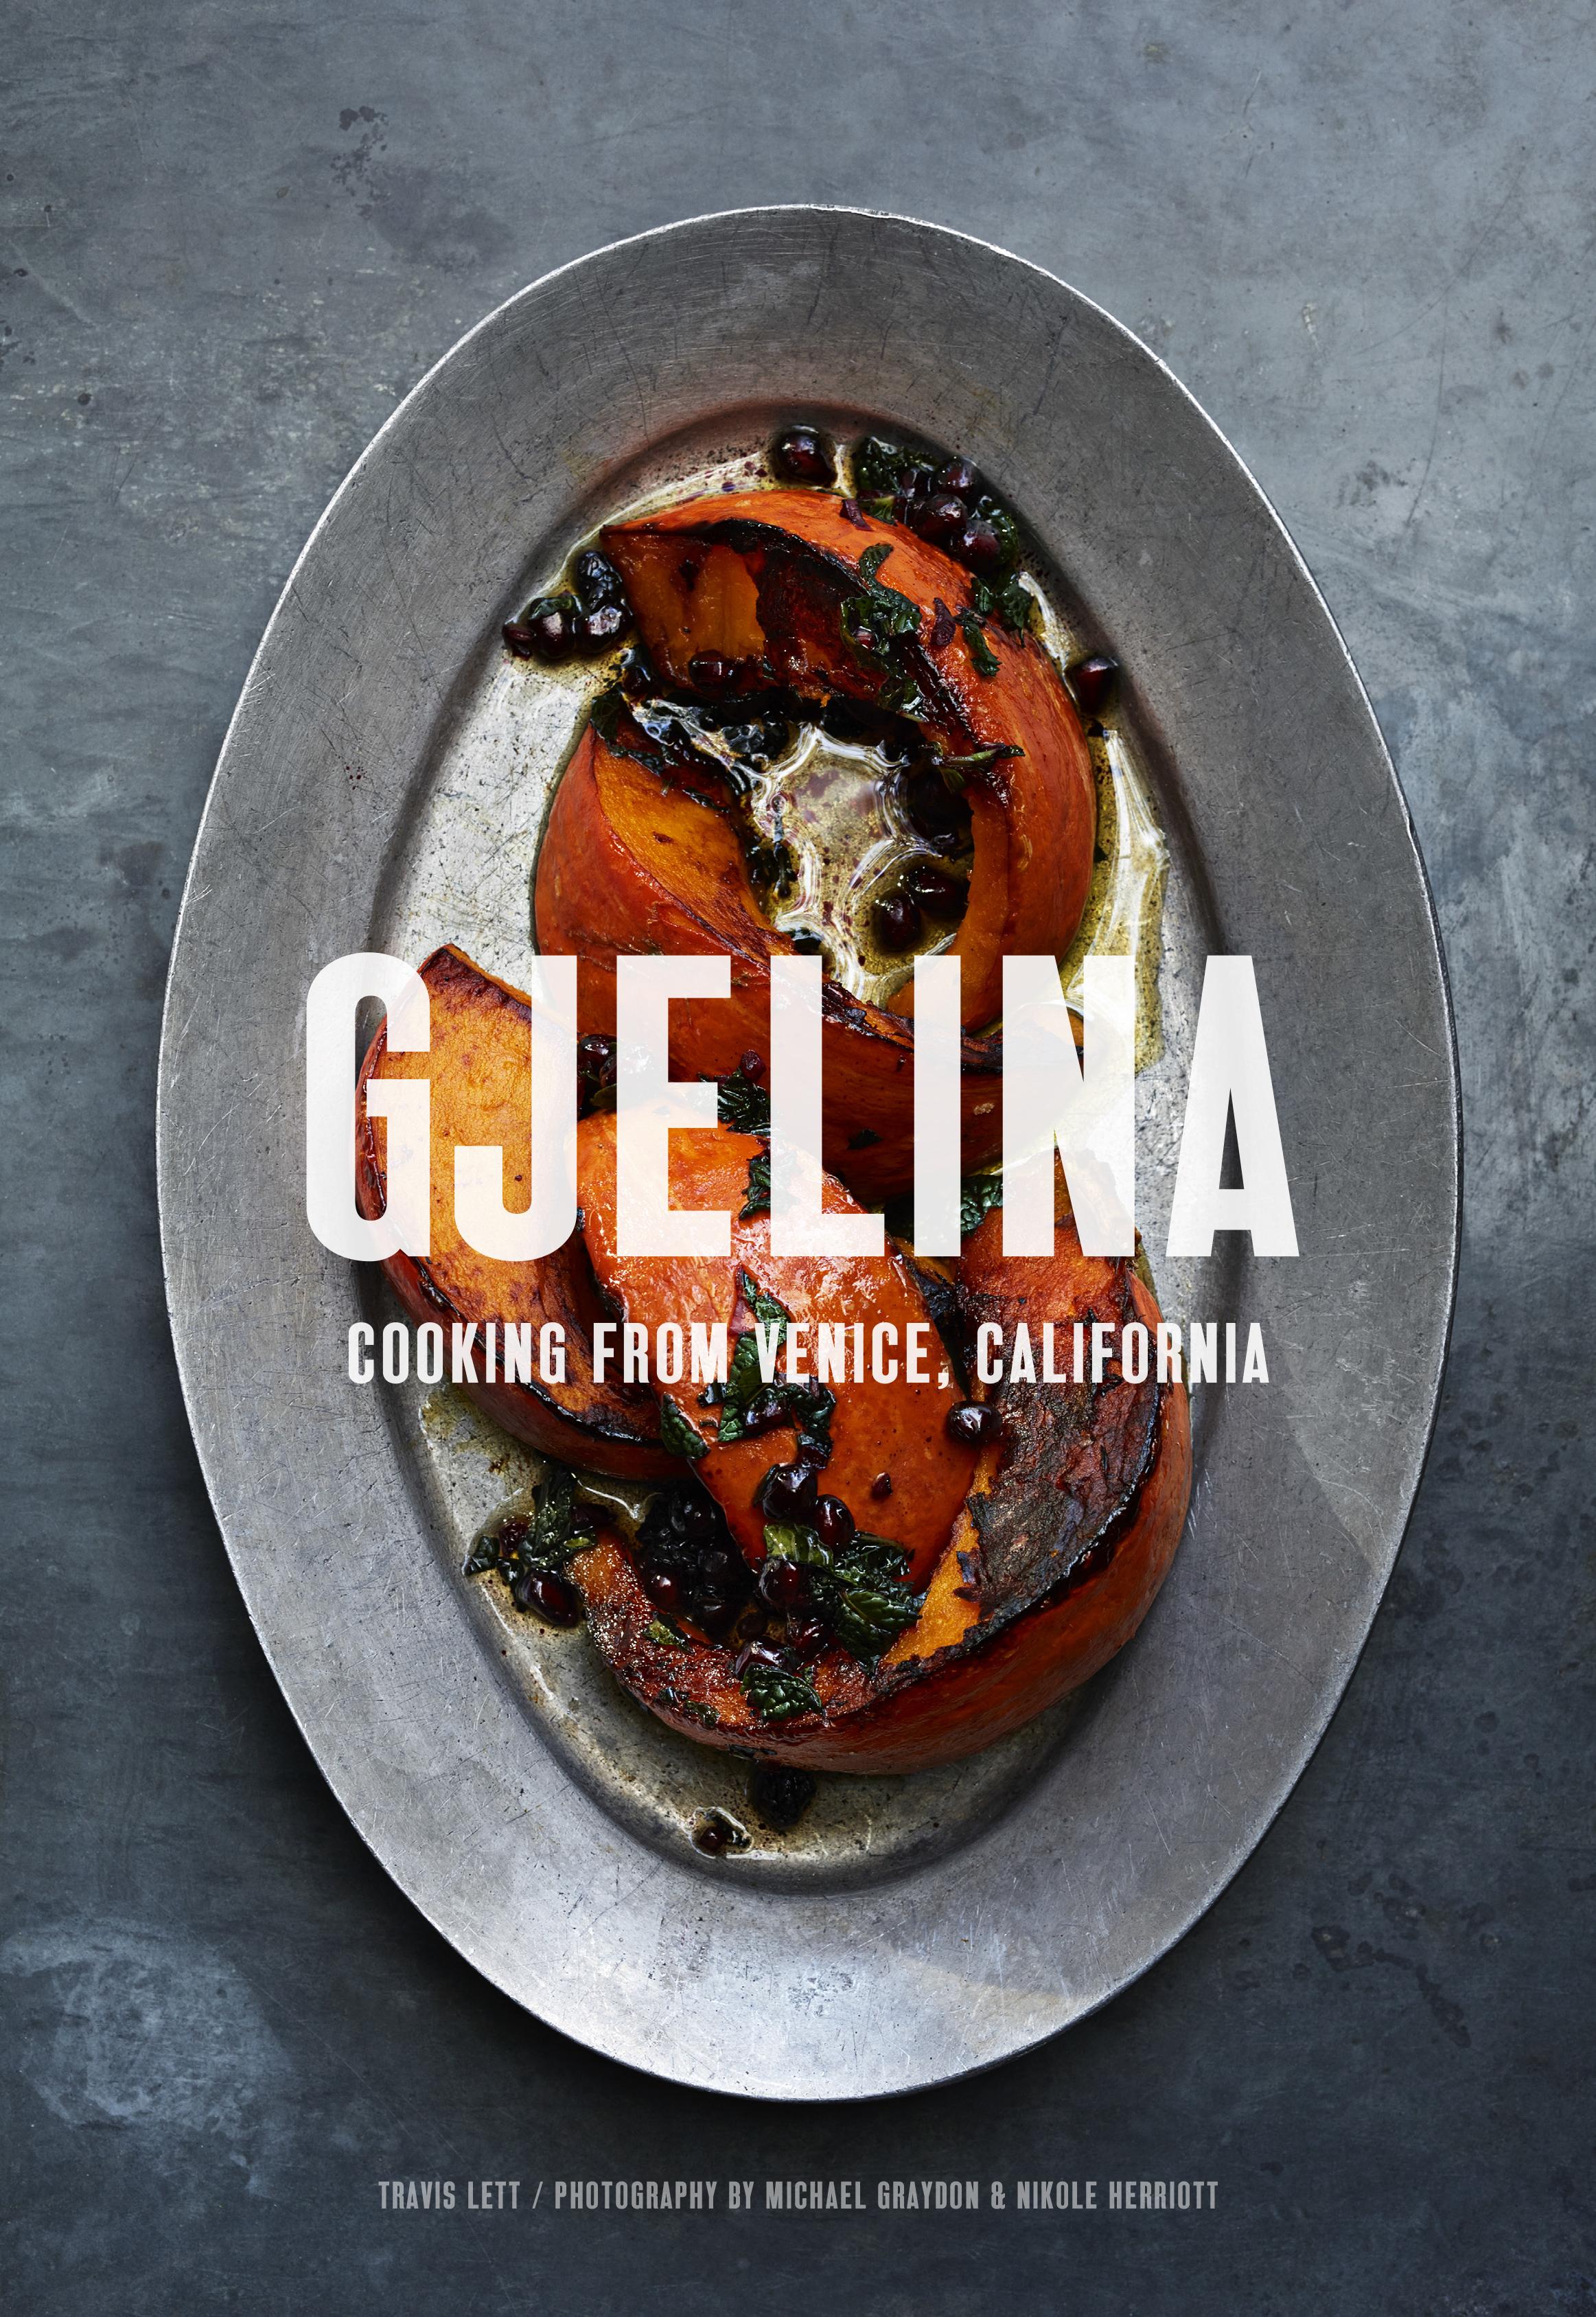 Bildergebnis für restaurant gjelina